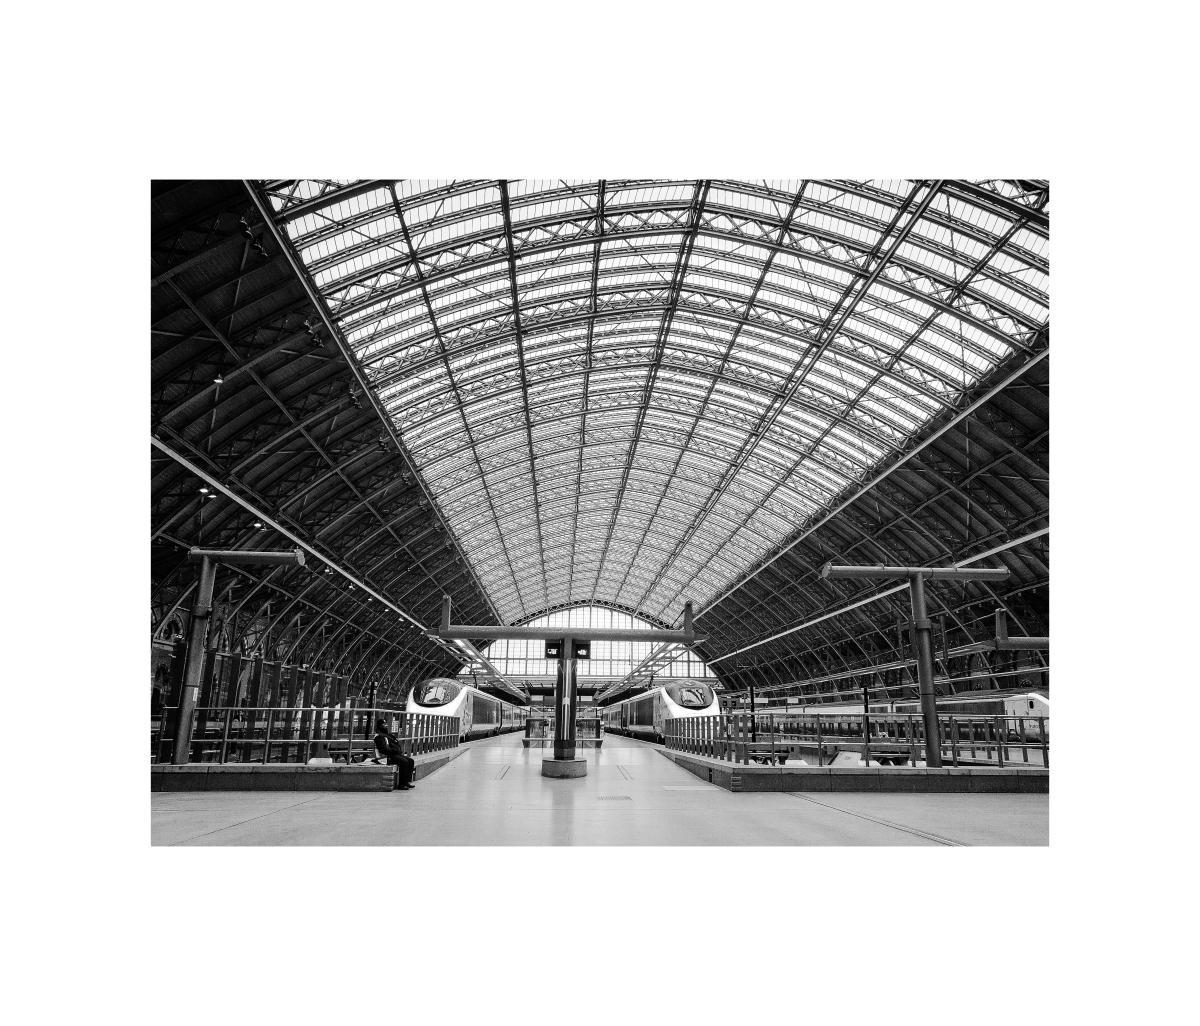 st-pancras-station-16x20